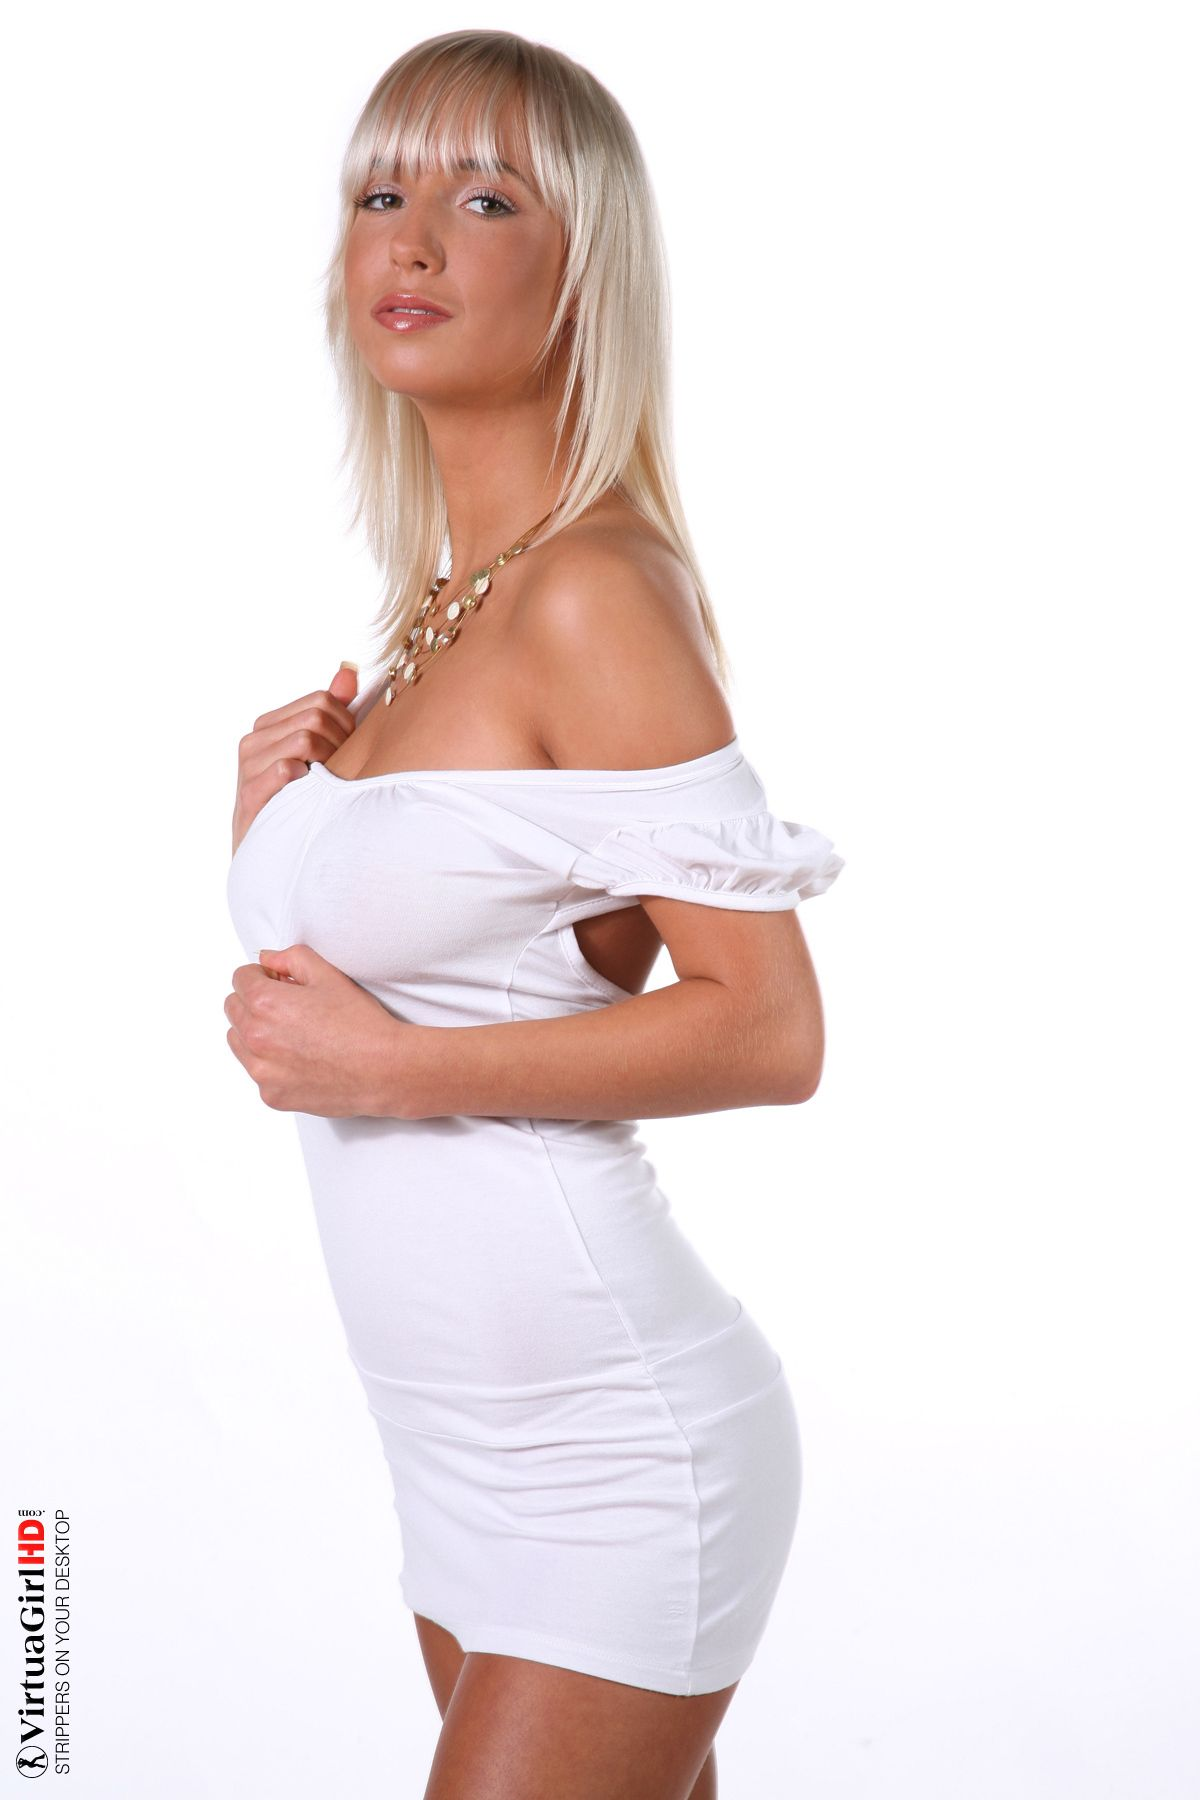 Natali Blond - COCONUT MILK 02